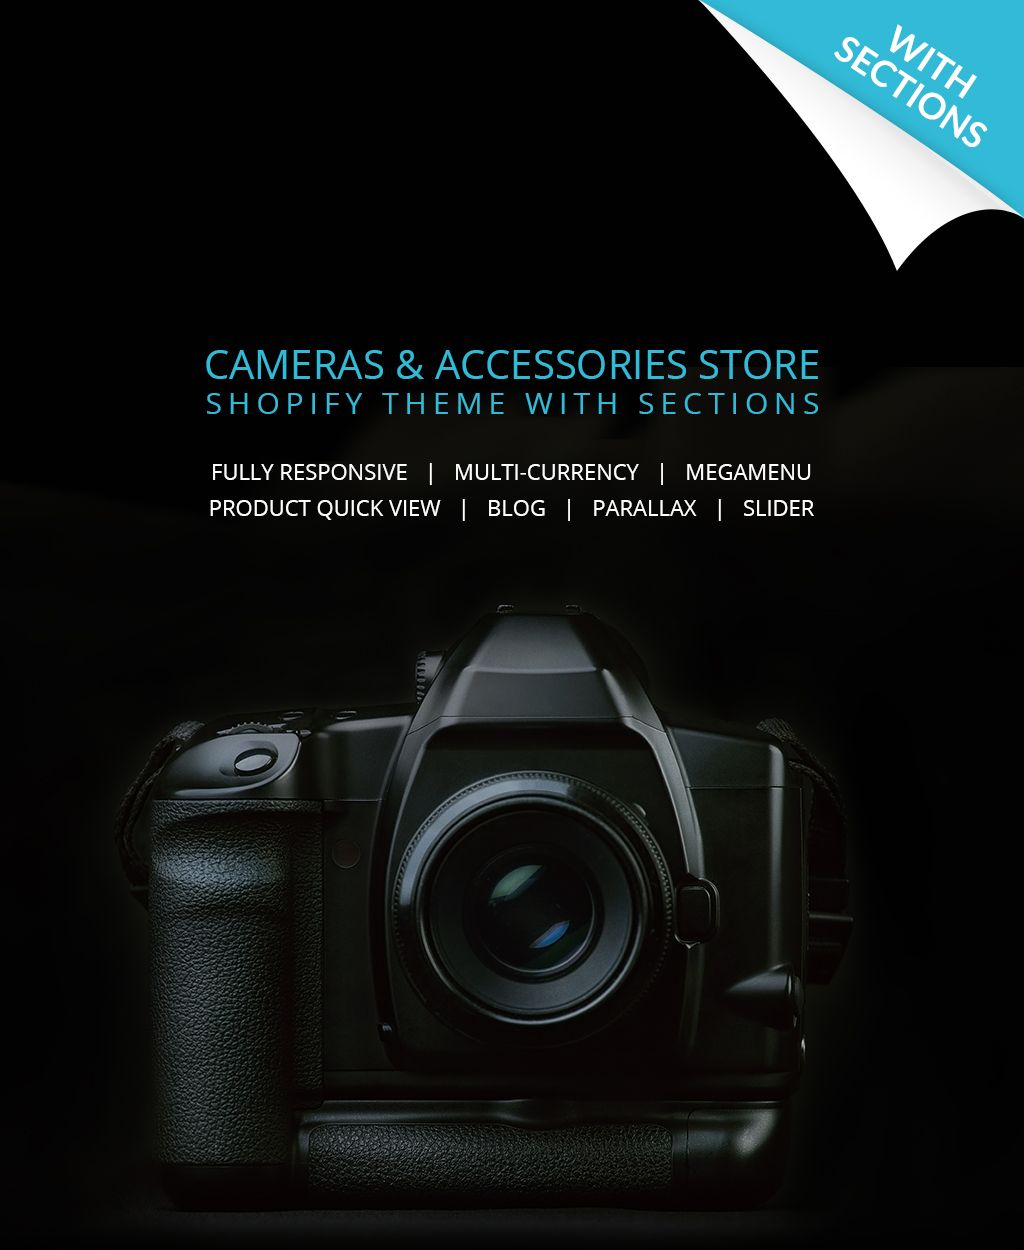 Electronics Store Responsive Shopify Theme #64635